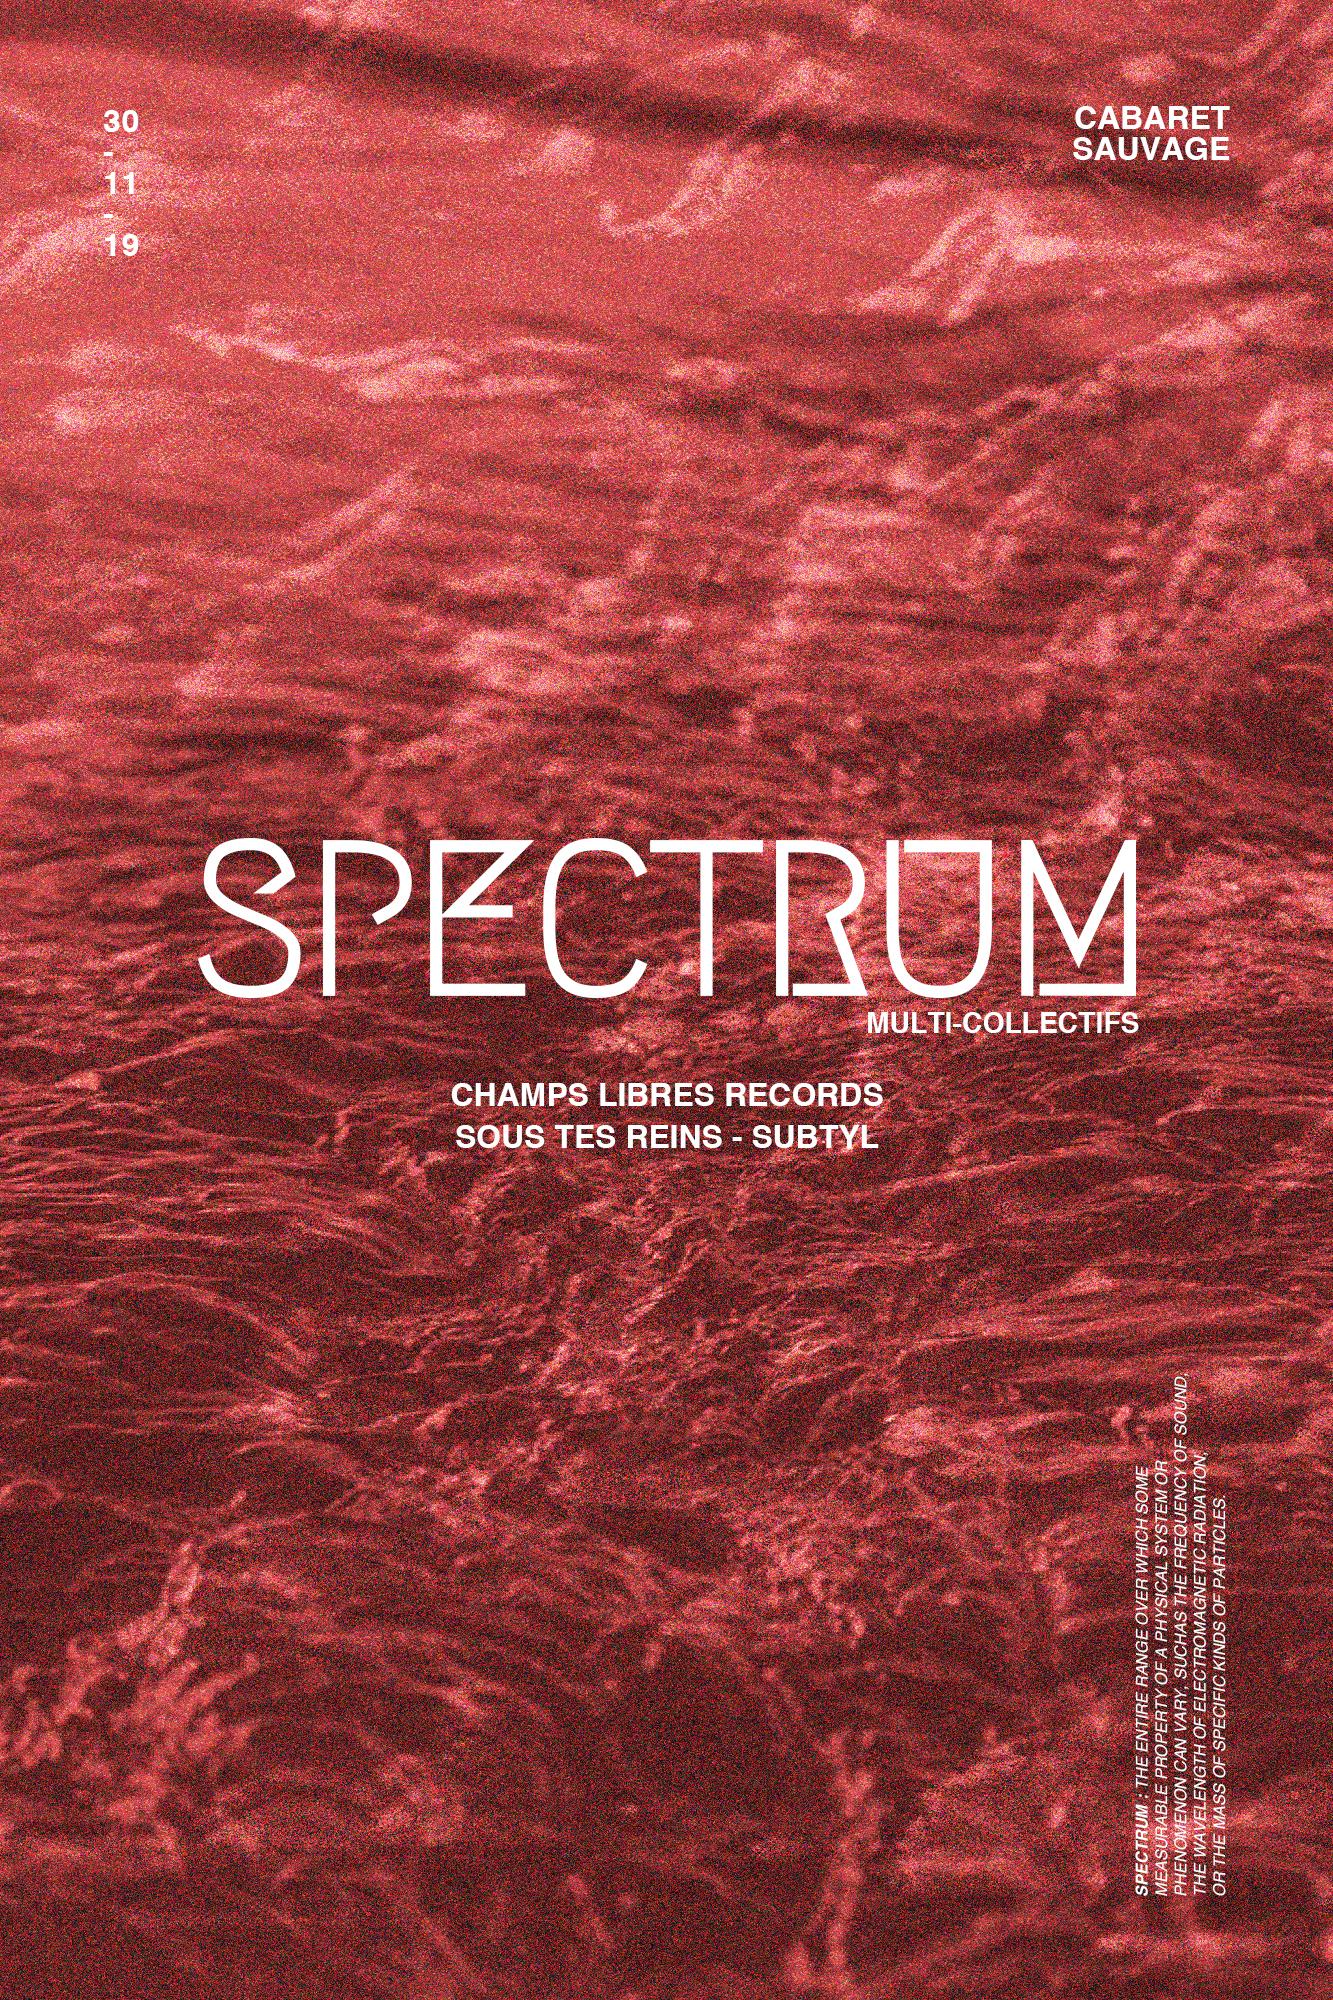 SPECTRUM MULTI COLLECTIFS